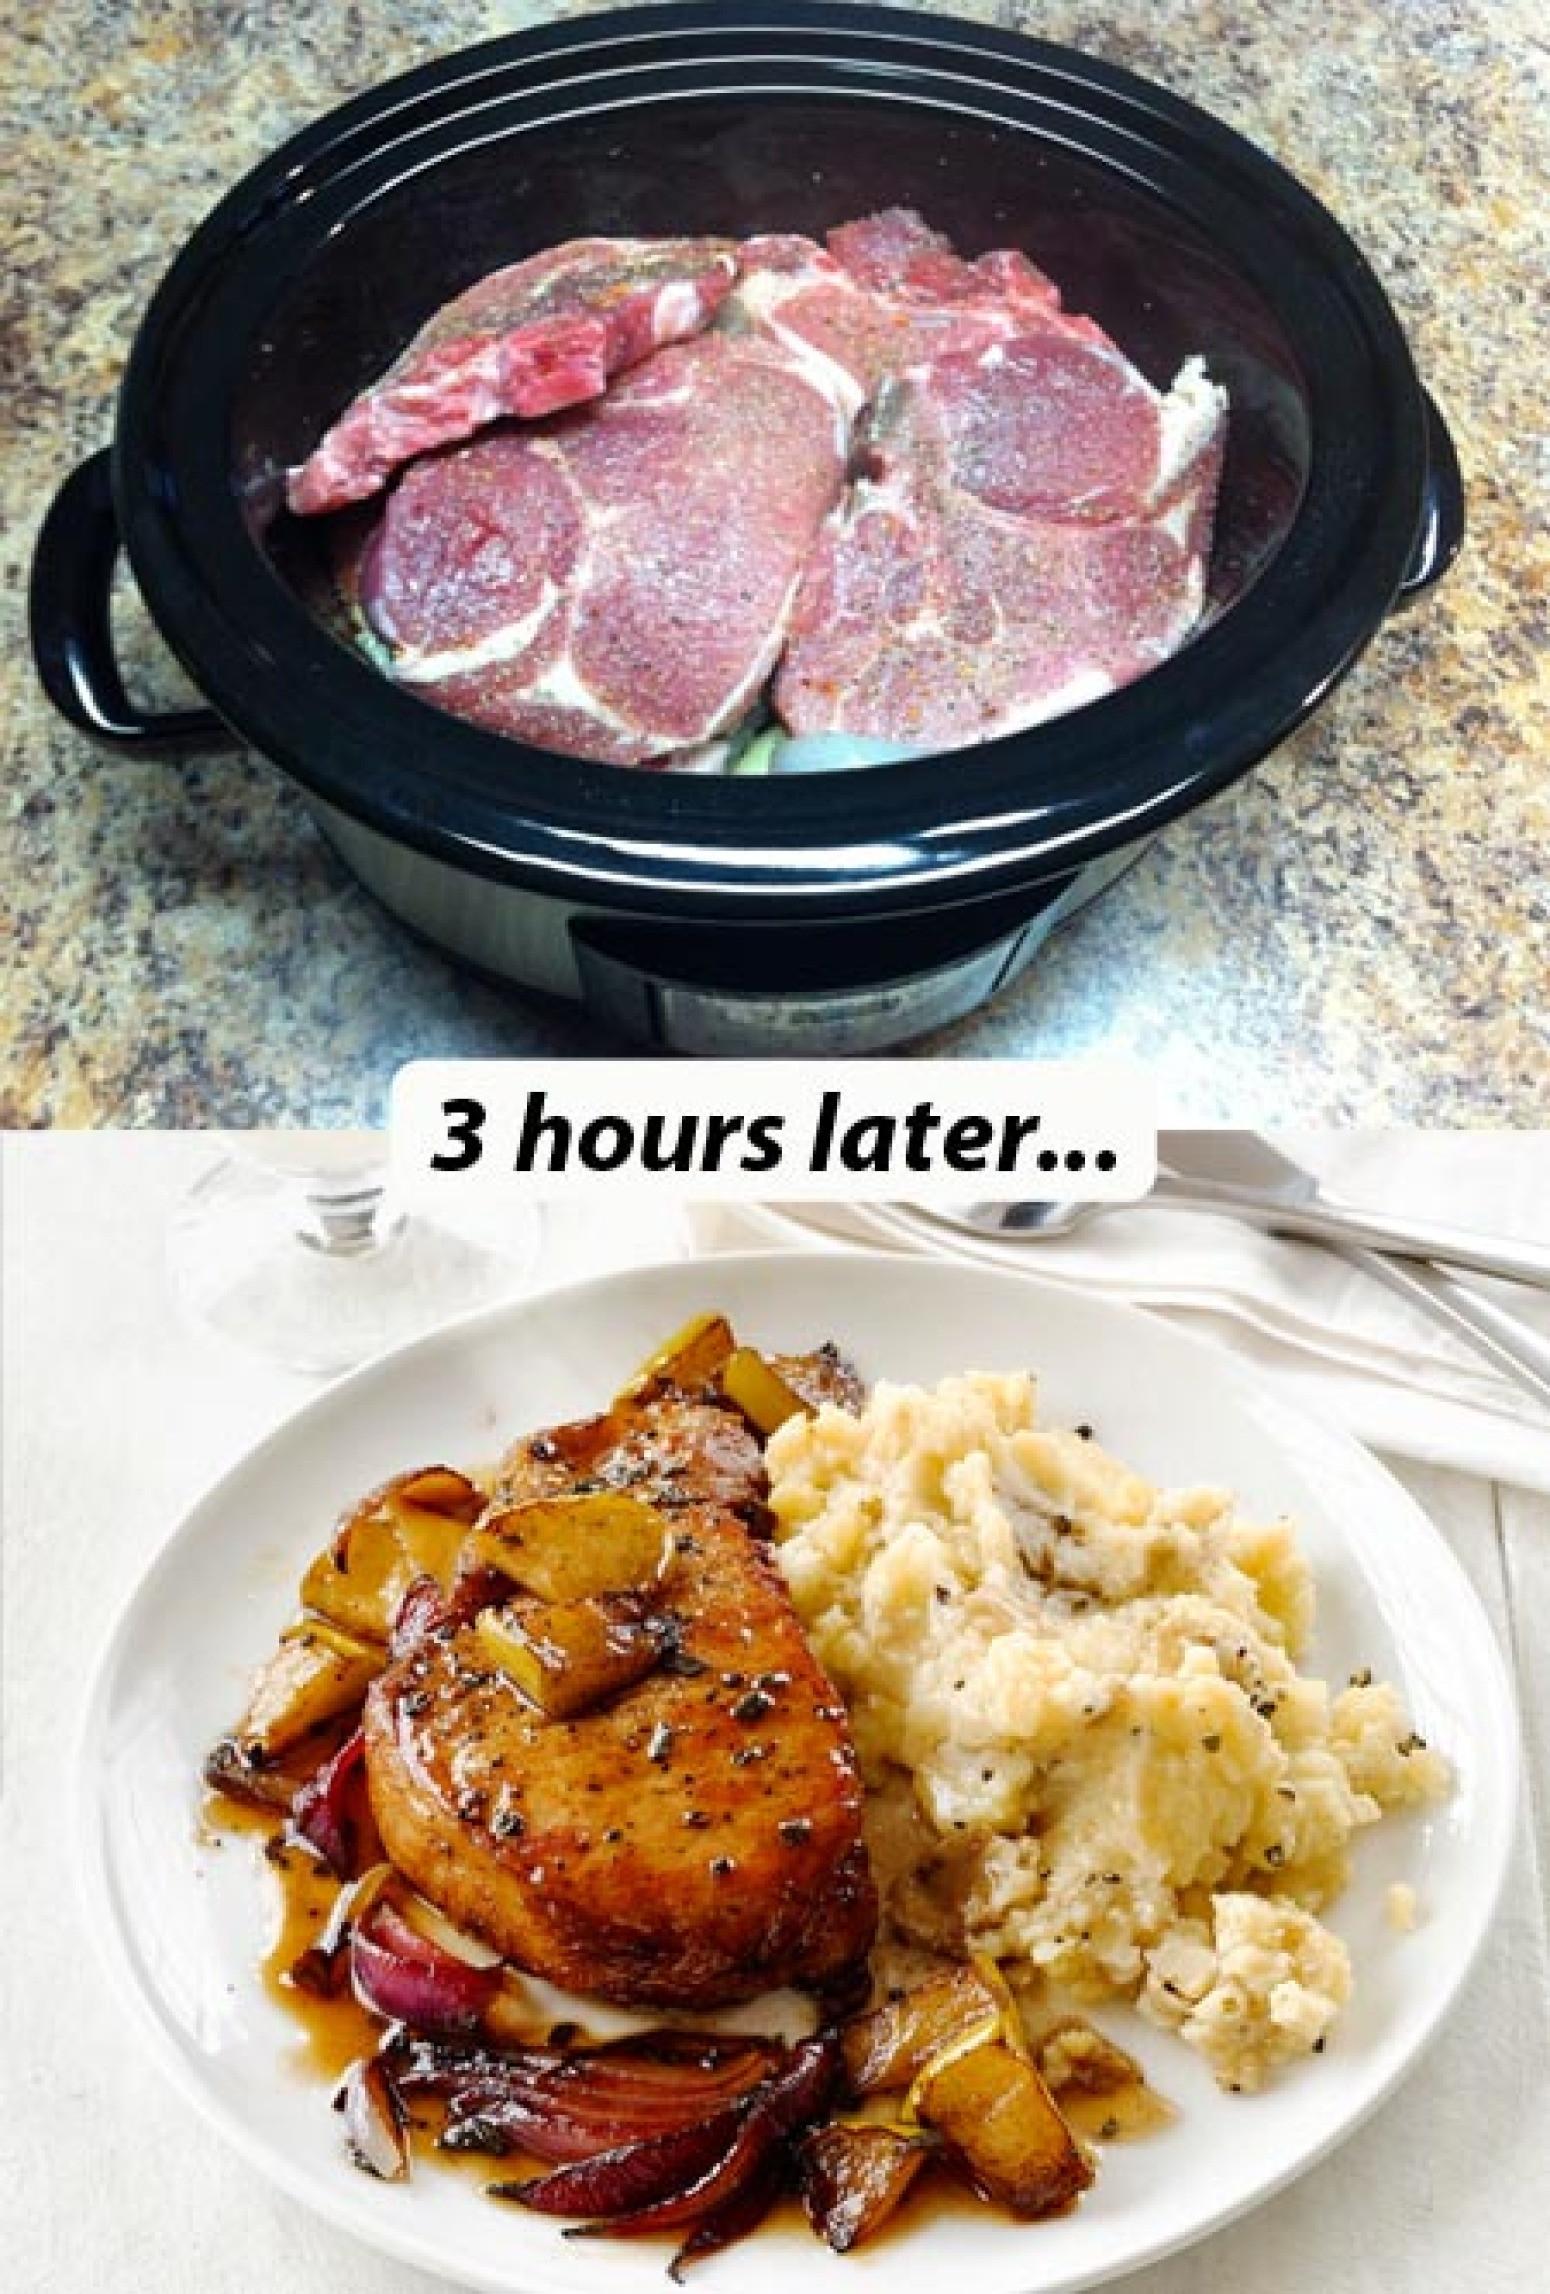 Easy Crockpot Pork Chops  Easy Crock Pot Pork Chops with Veggies Recipe 2